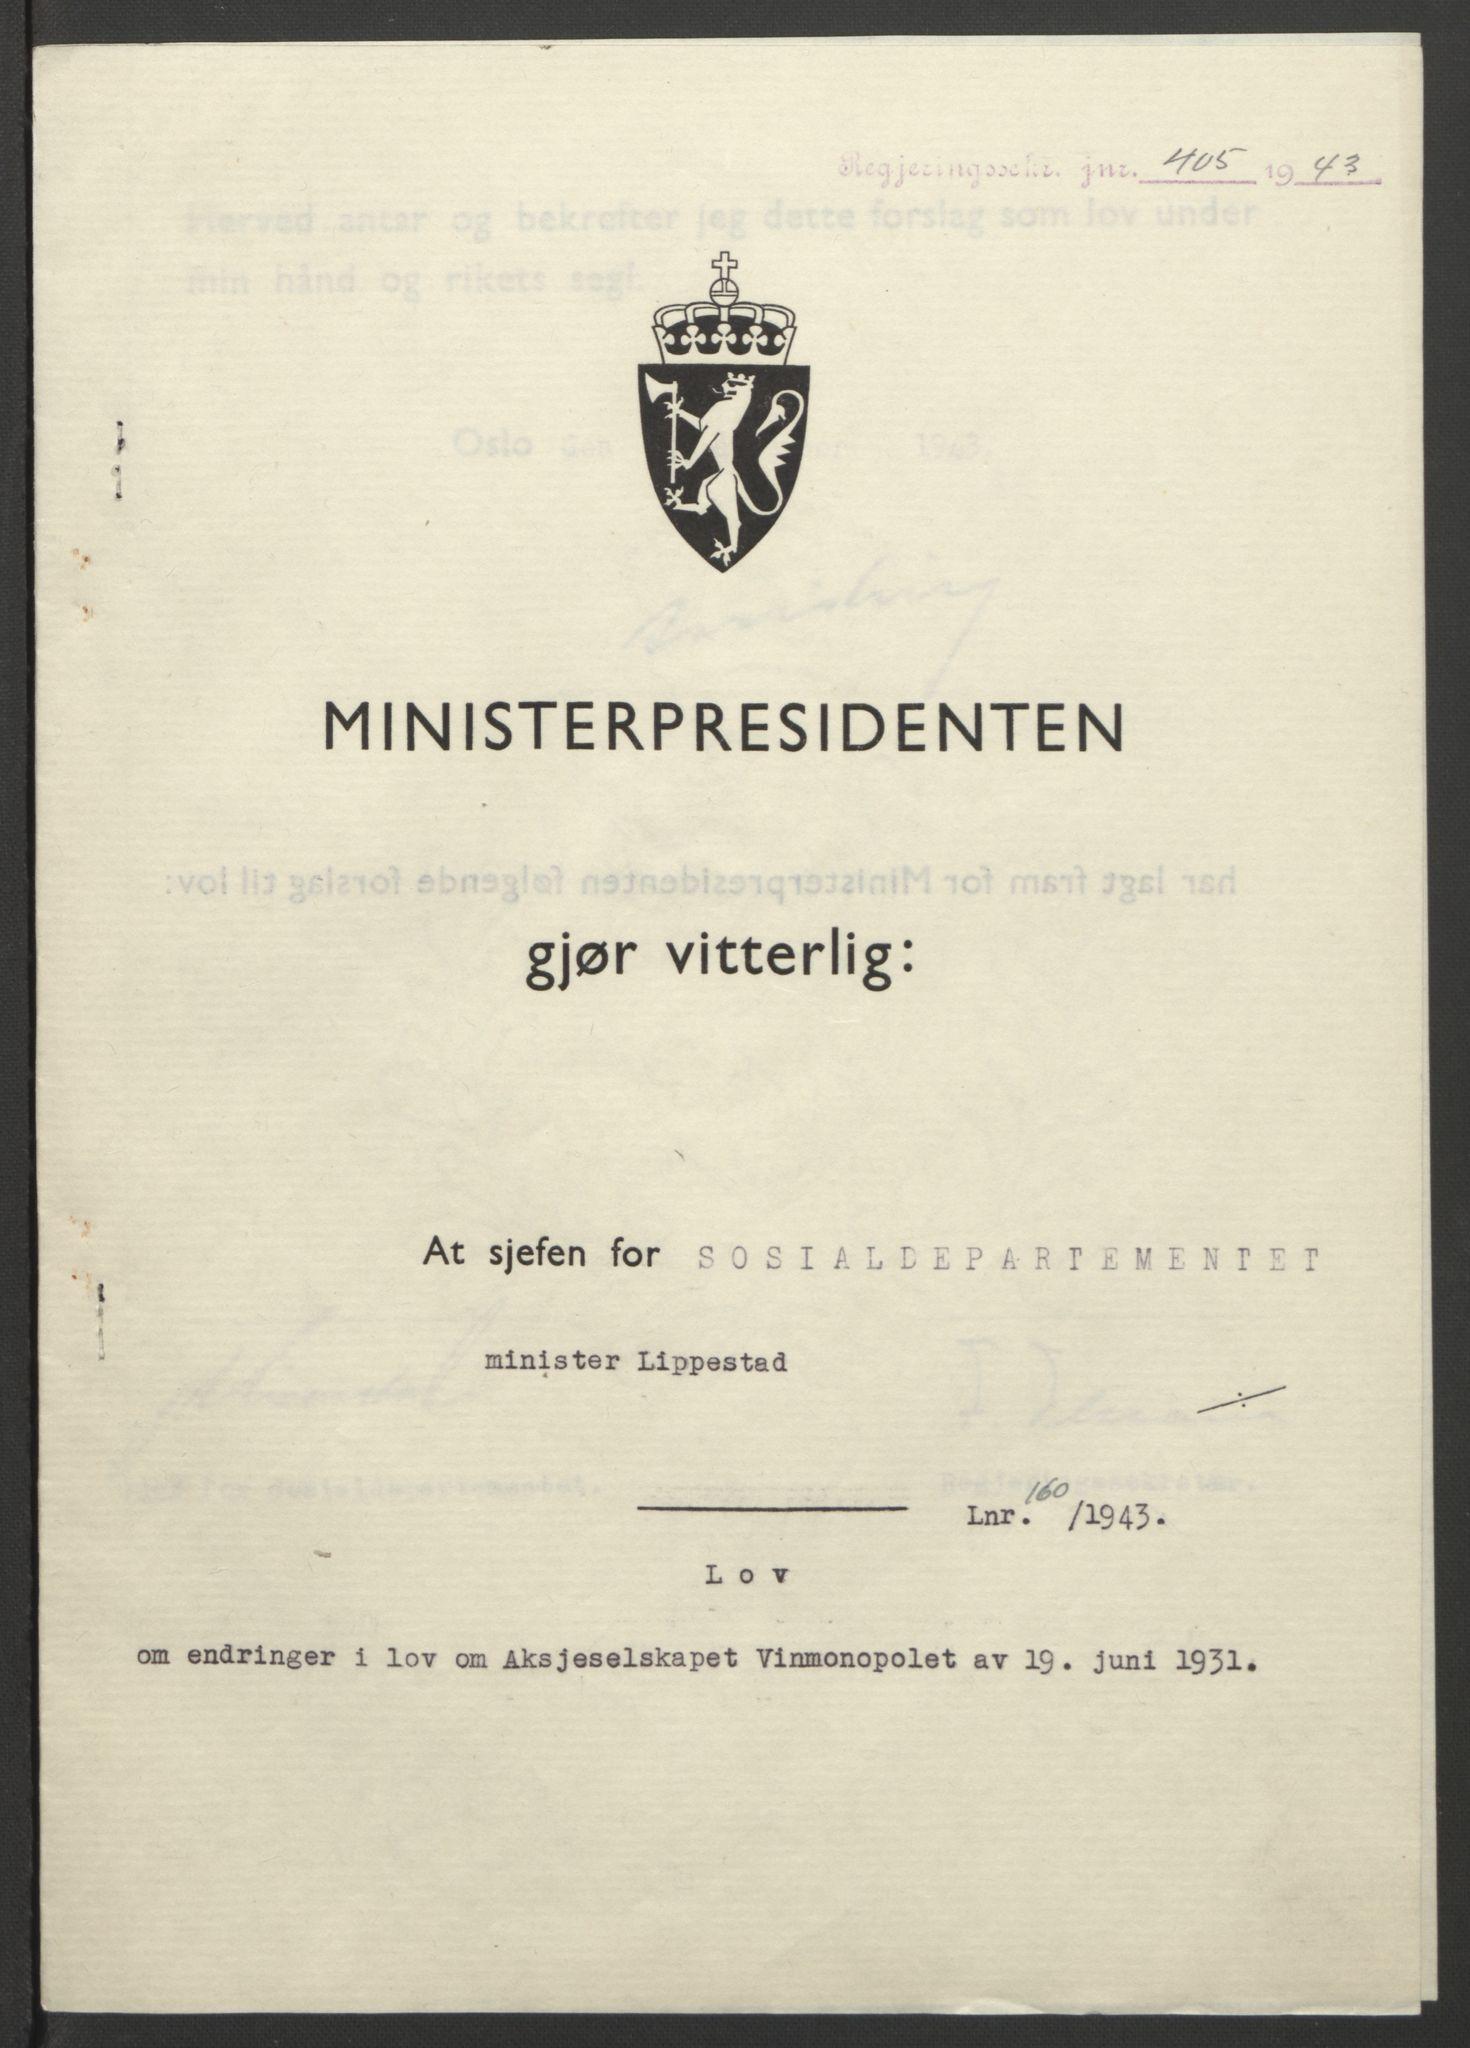 RA, NS-administrasjonen 1940-1945 (Statsrådsekretariatet, de kommisariske statsråder mm), D/Db/L0099: Lover, 1943, s. 757